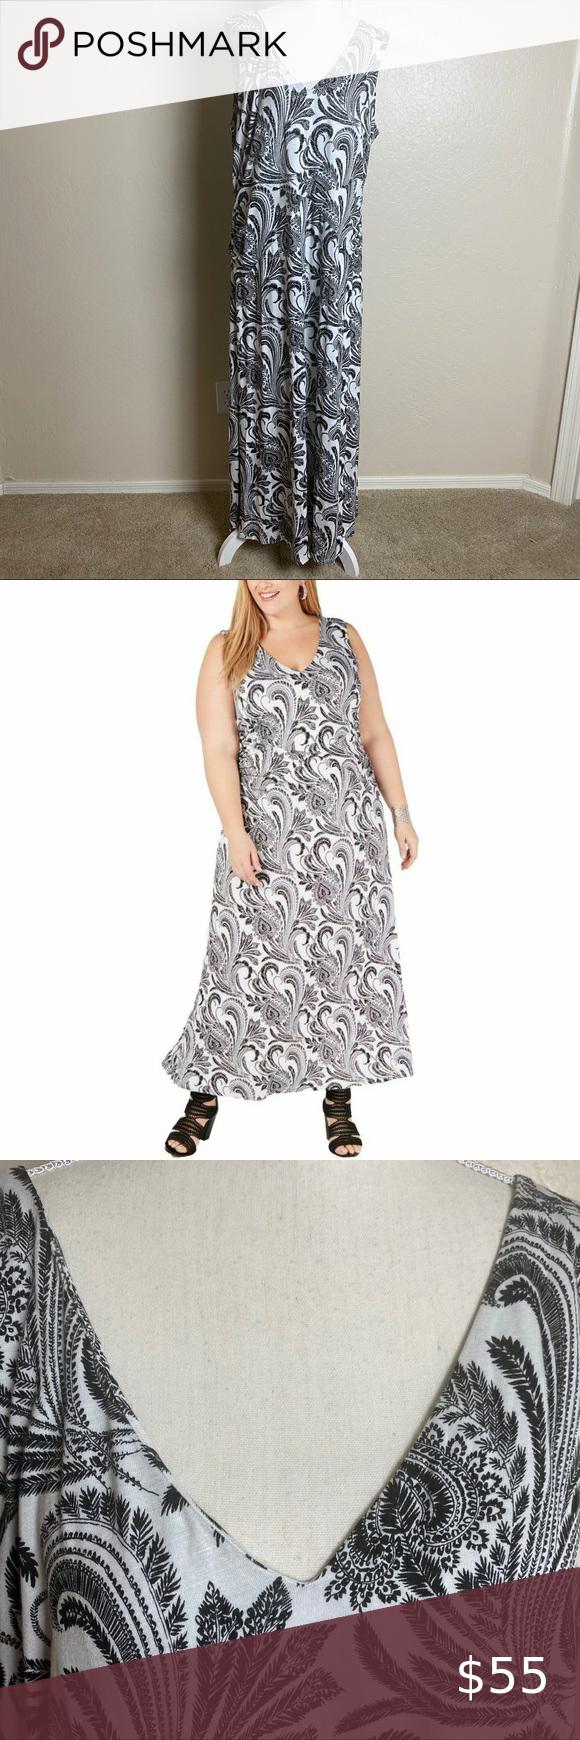 Inc Nwt White Black Paisley Maxi Dress 2x Paisley Maxi Dress Snake Print Maxi Dress Form Fitting Maxi Dress [ 1740 x 580 Pixel ]